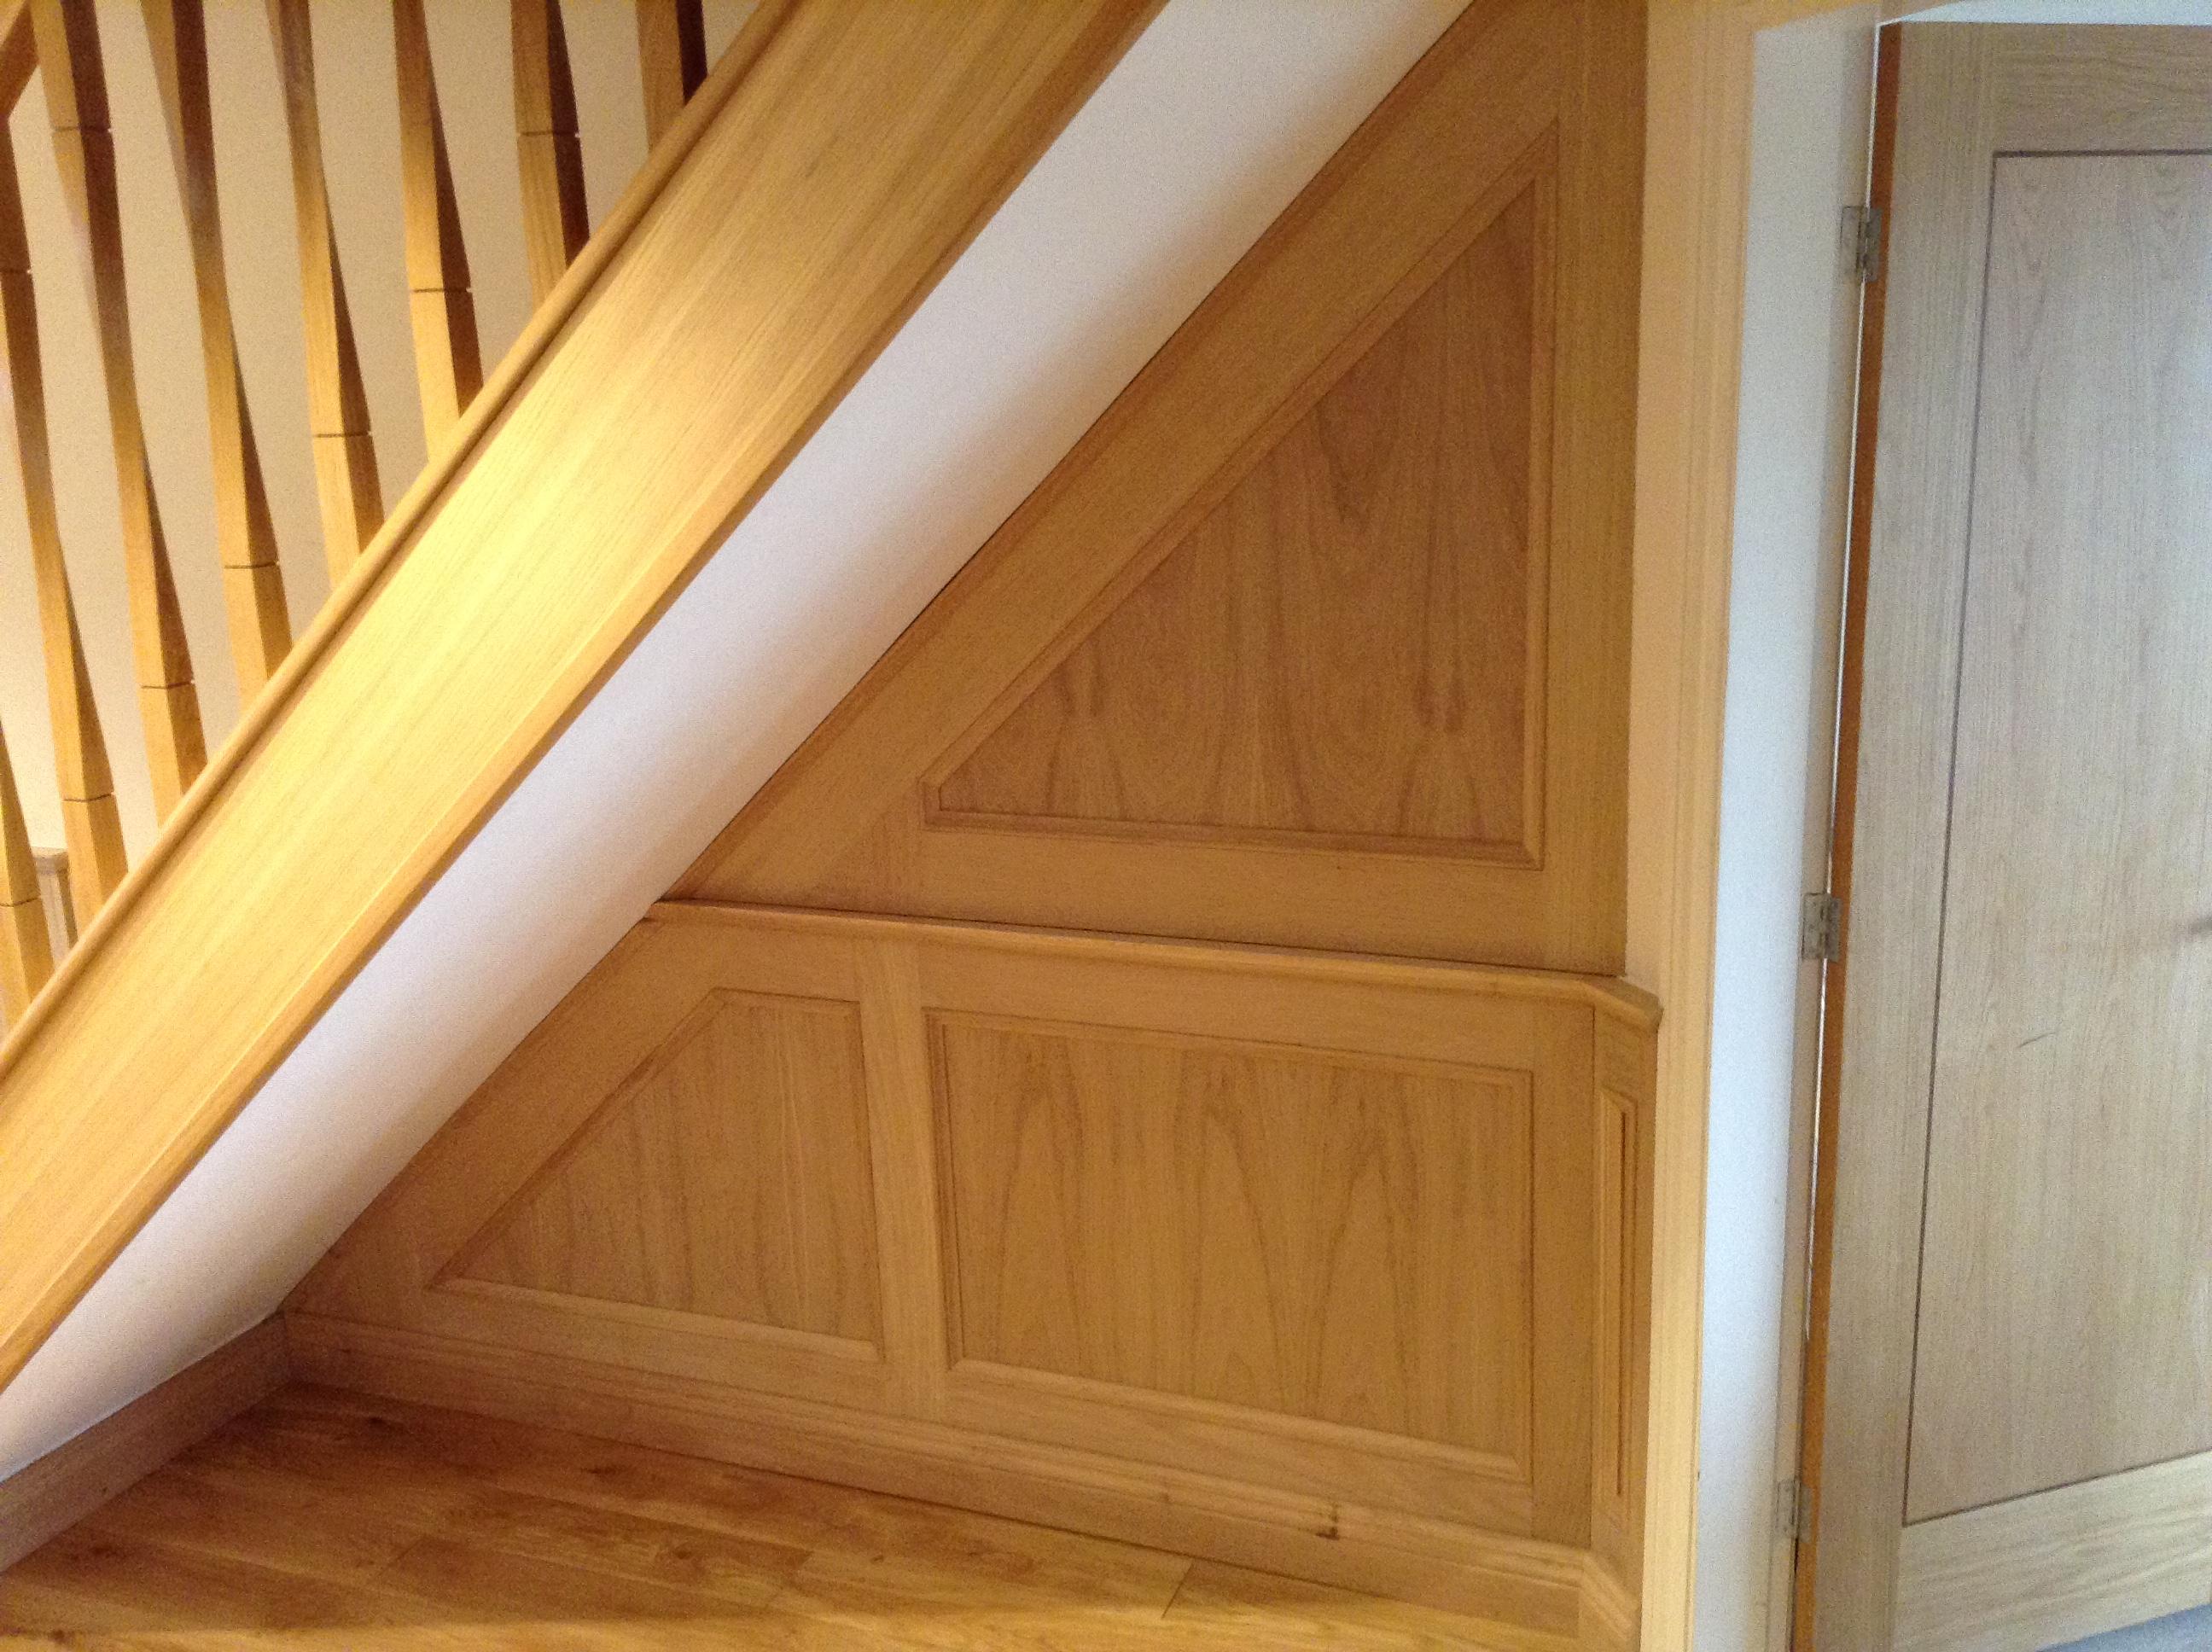 oak panelling. Oak Wall Panelling   Decorative Wood Panelling   Wall Panelling